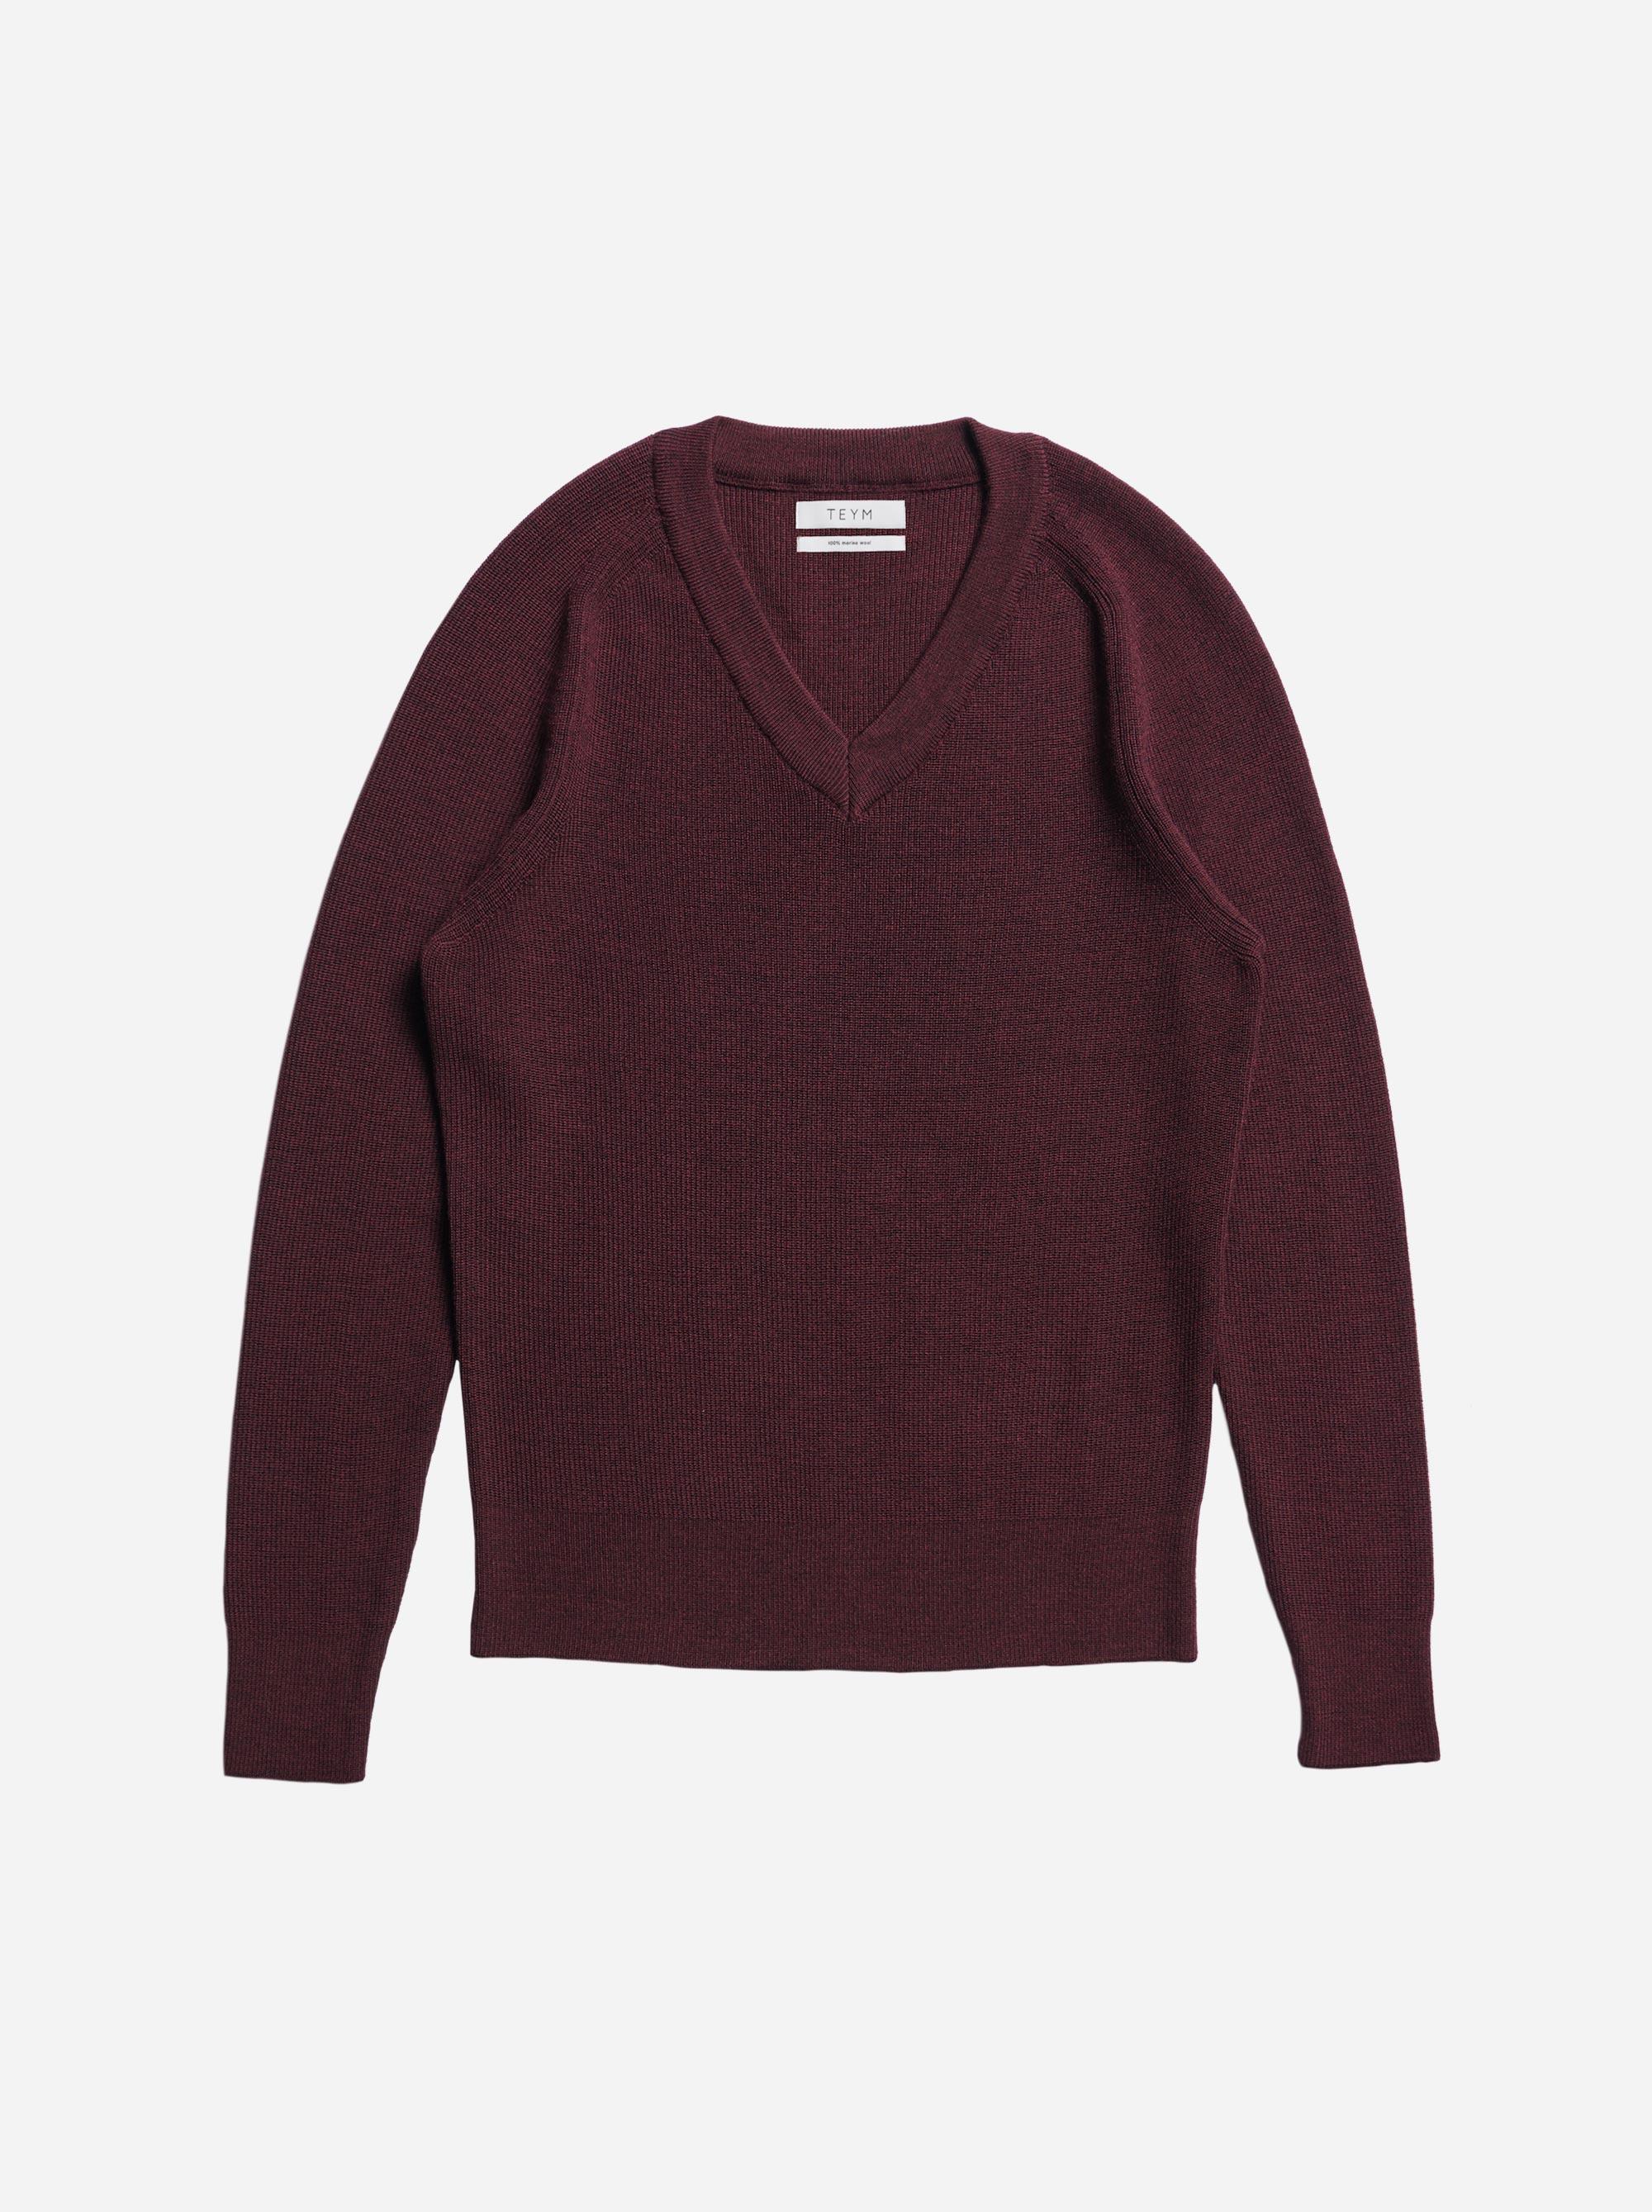 Teym - V-Neck - The Merino Sweater - Men - Burgundy - 4